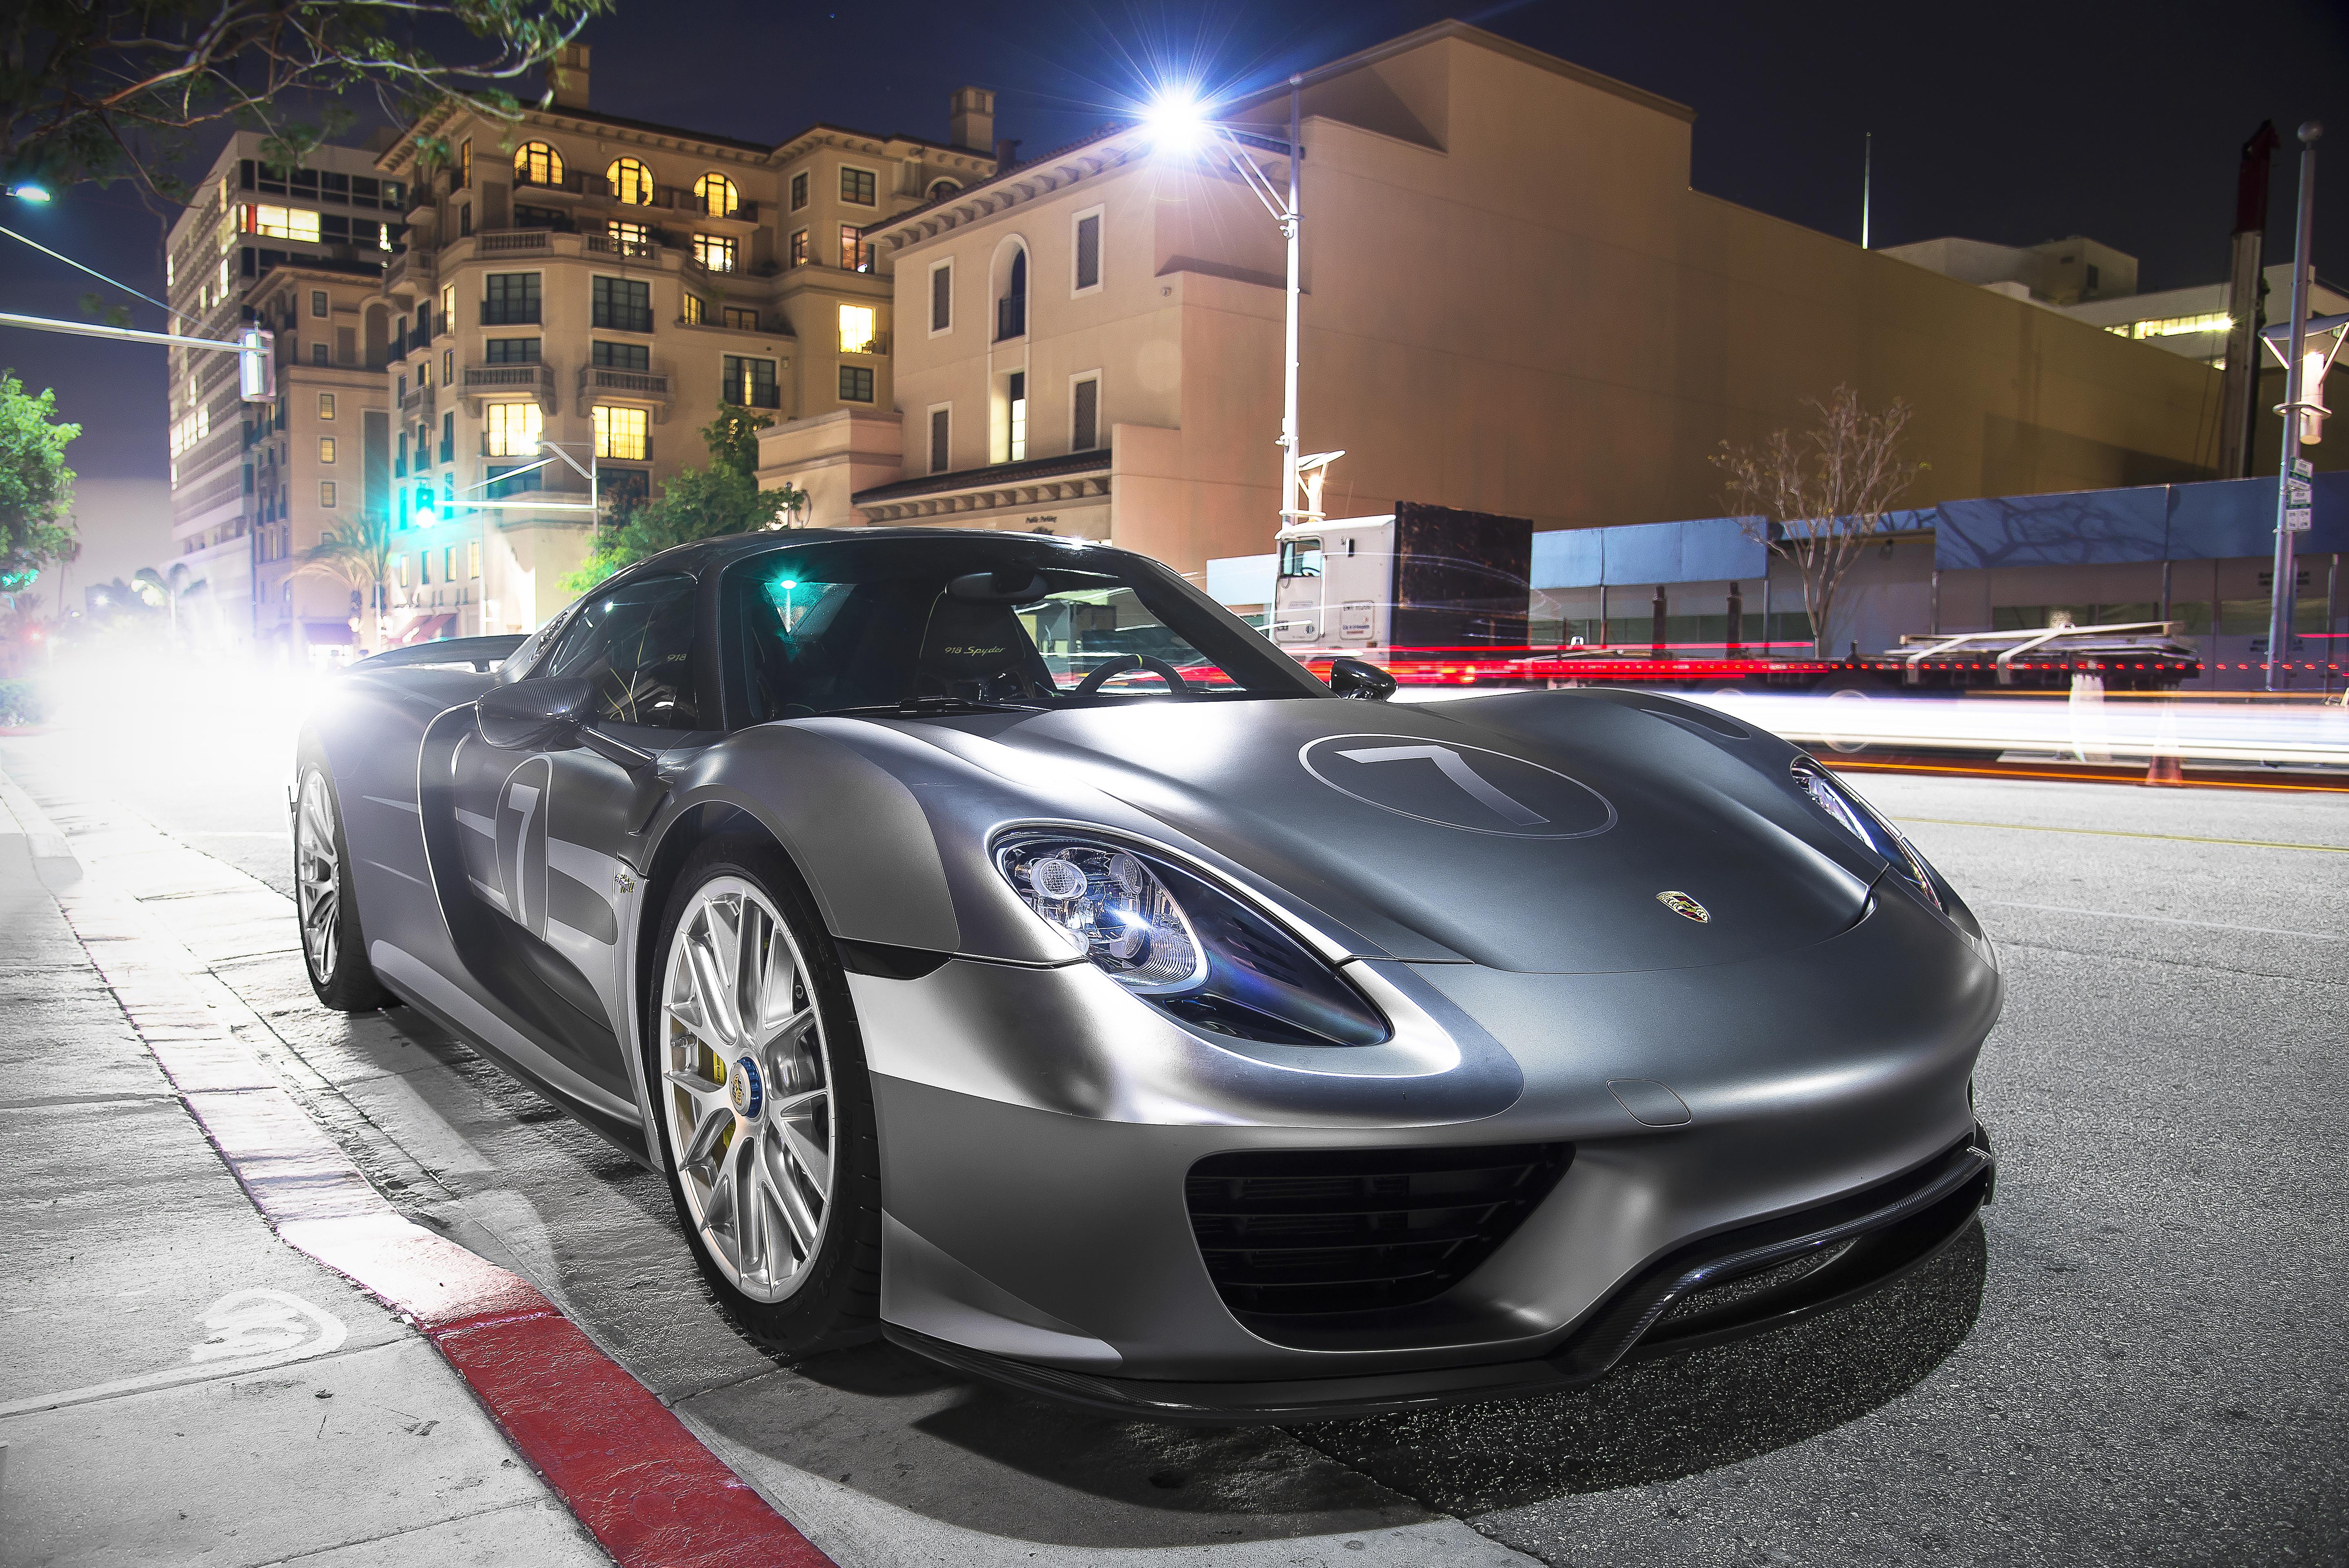 Porsche_918_Spyder_with_Weissach_Package_%2820022564930%29 Surprising Porsche 918 Spyder Brochure Pdf Cars Trend